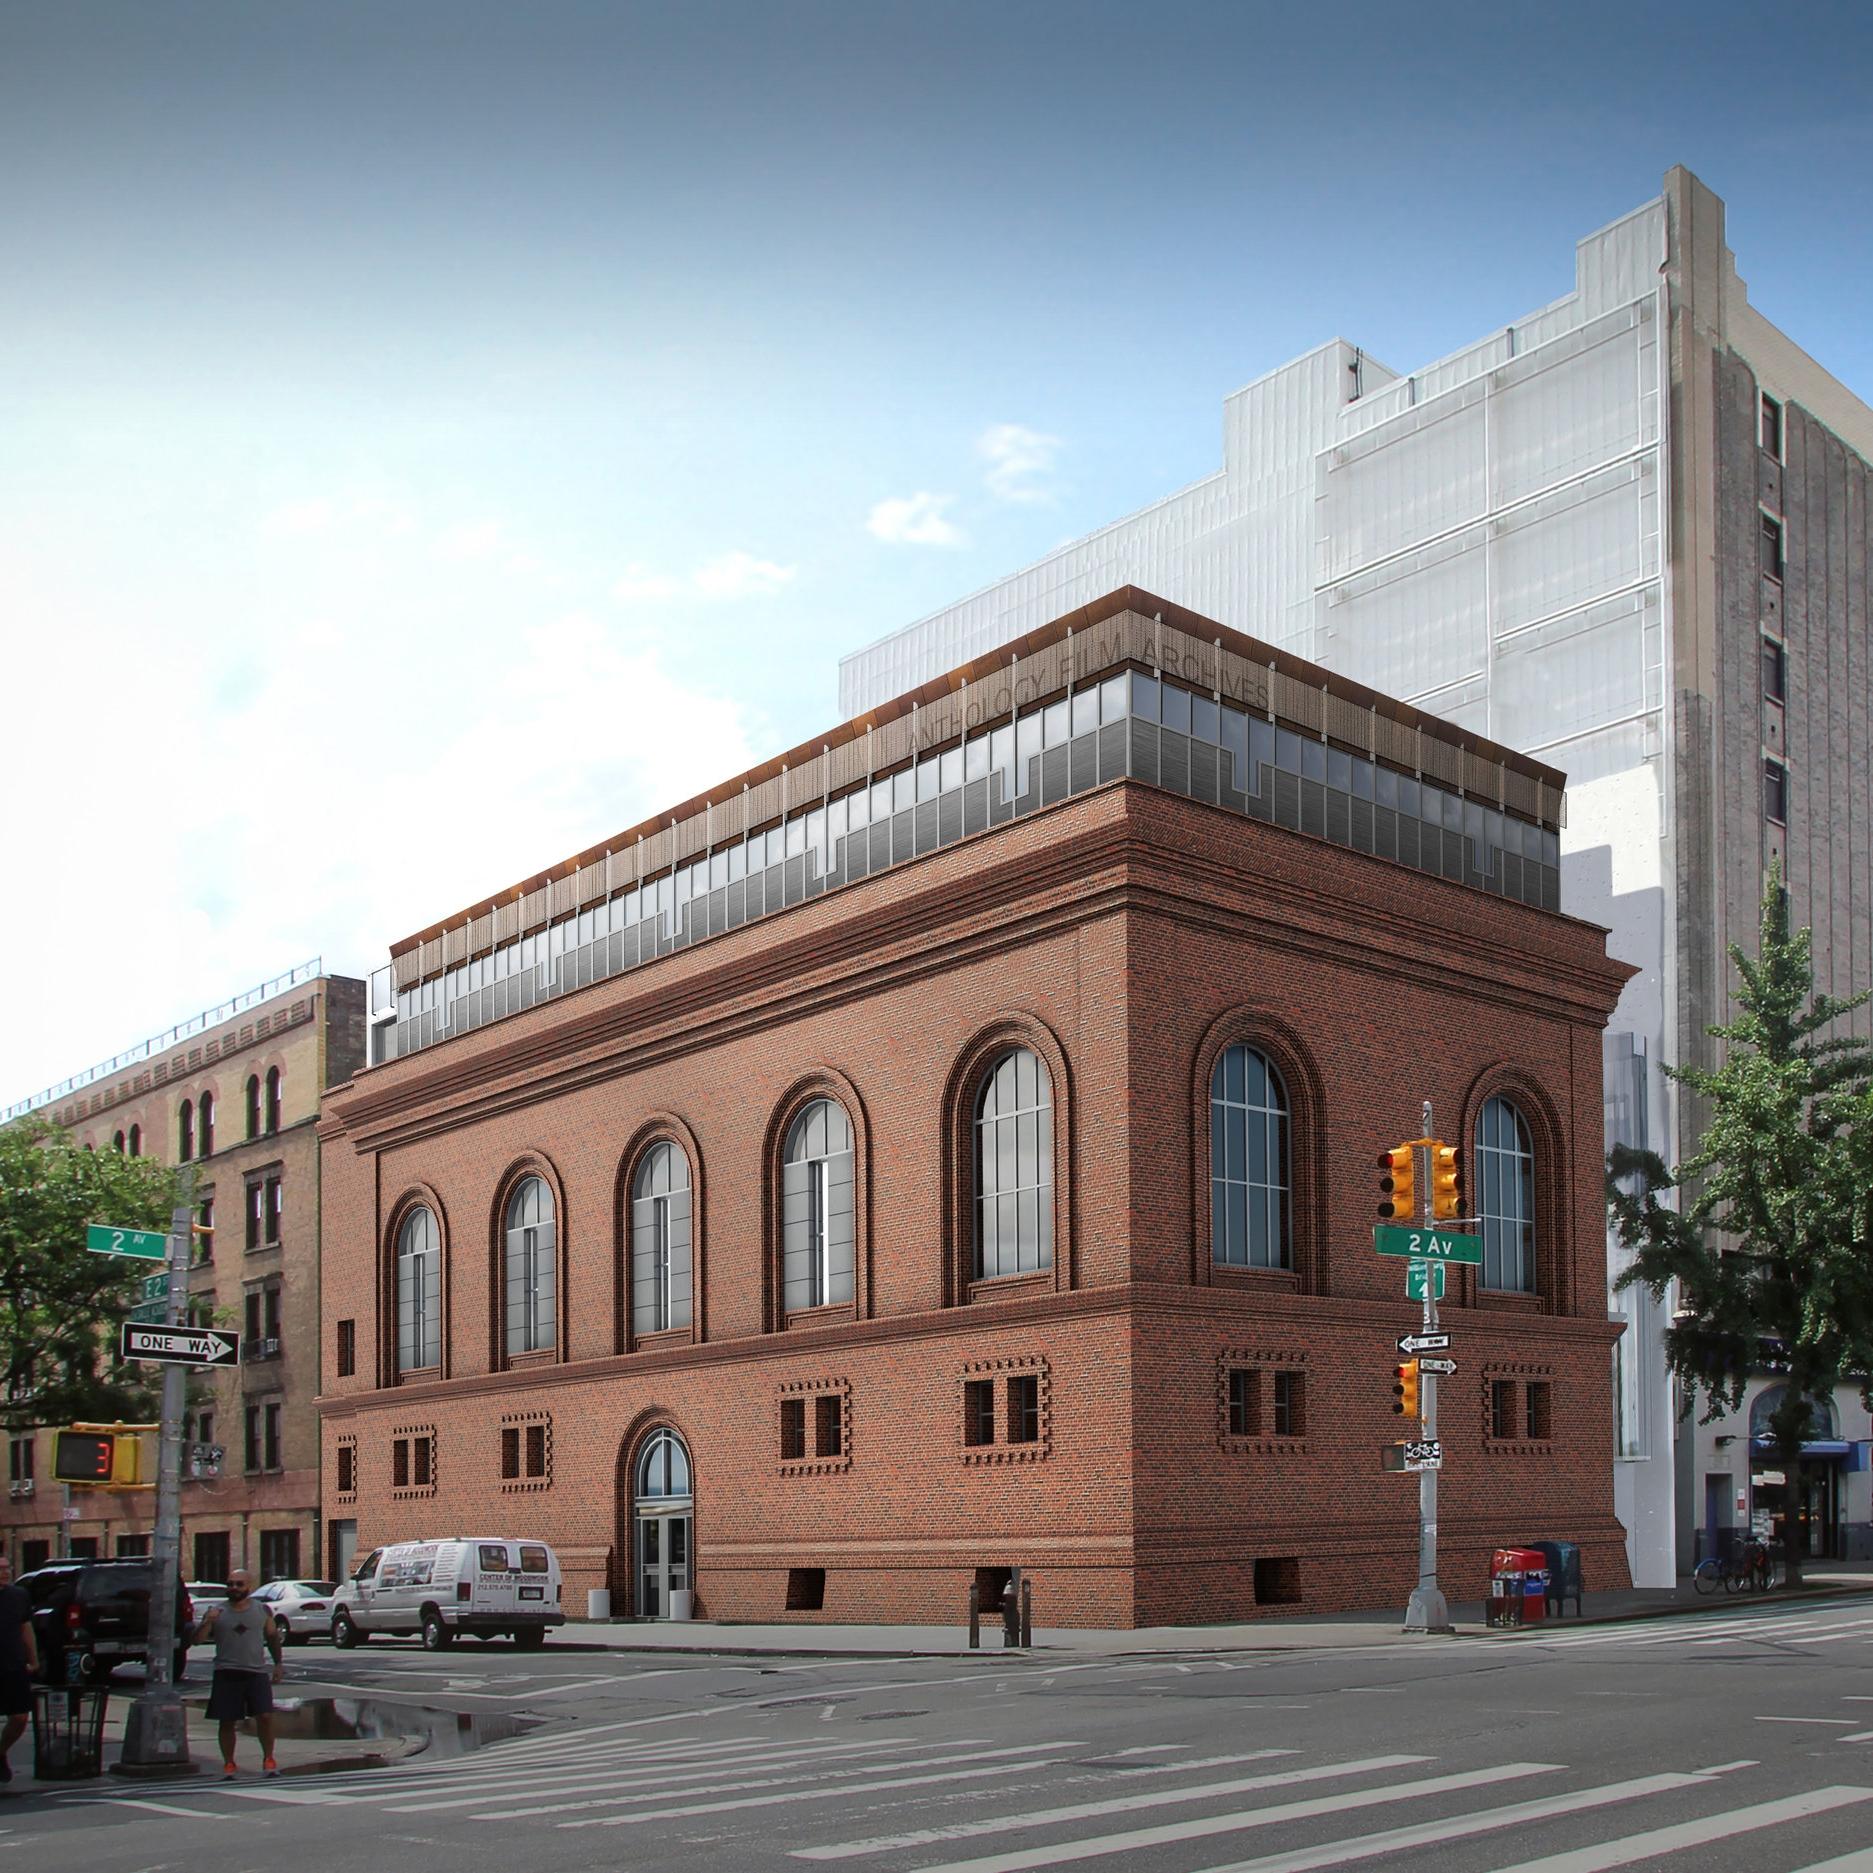 Anthology Film Archives - New York, NY